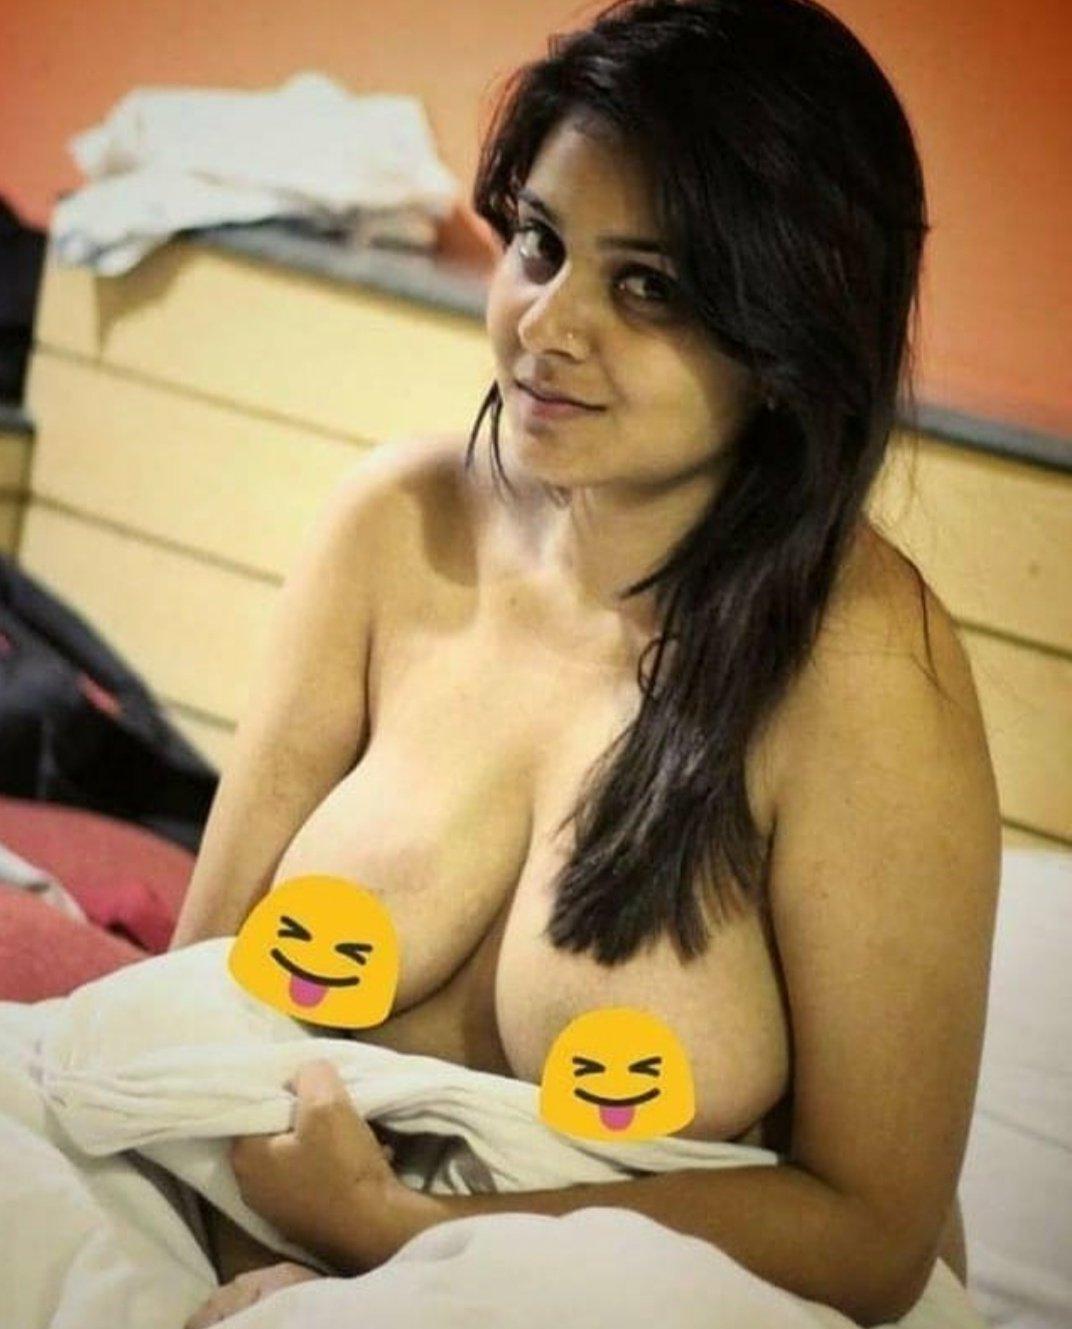 desi randi nangi pics 2 1 - Desi Randi Ki chudai Sexy Nude Gand Chut Pics